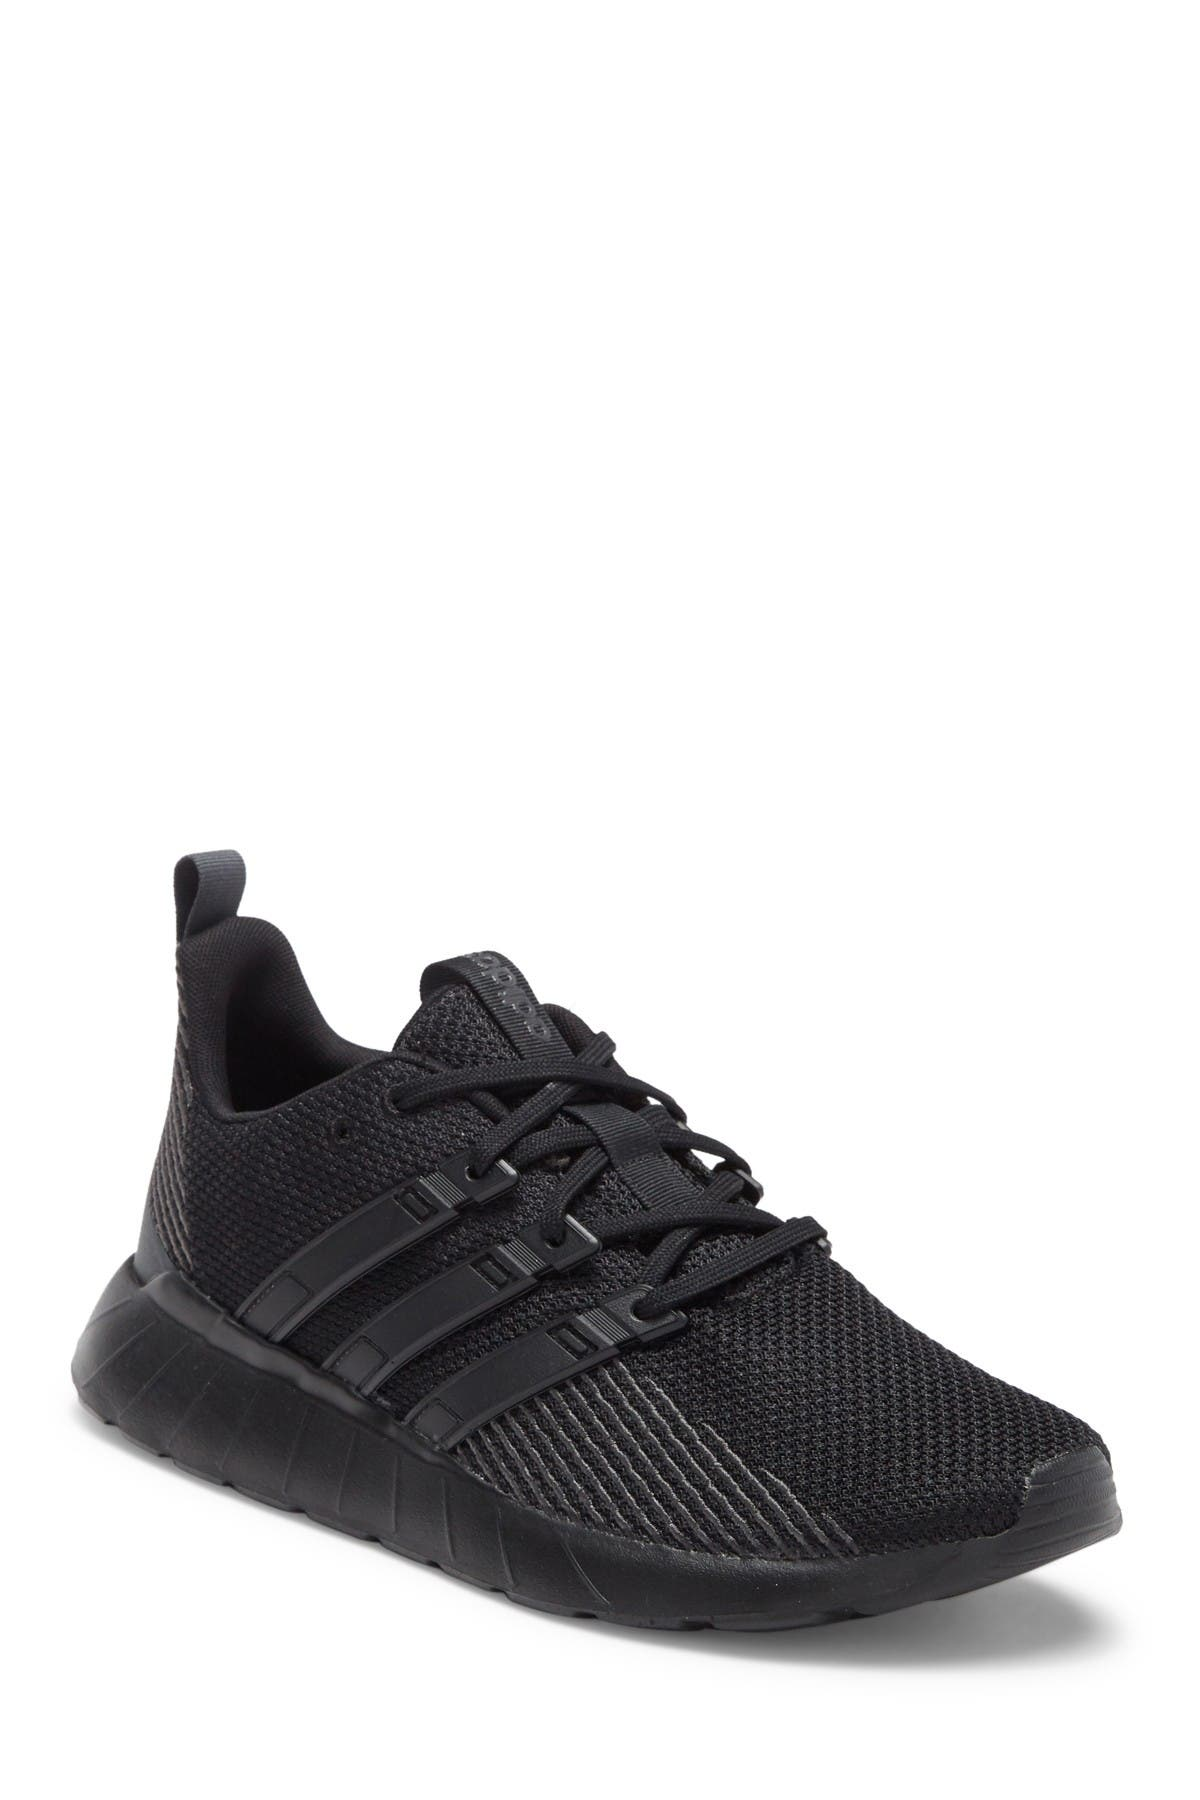 adidas | Questar Flow Running Shoe